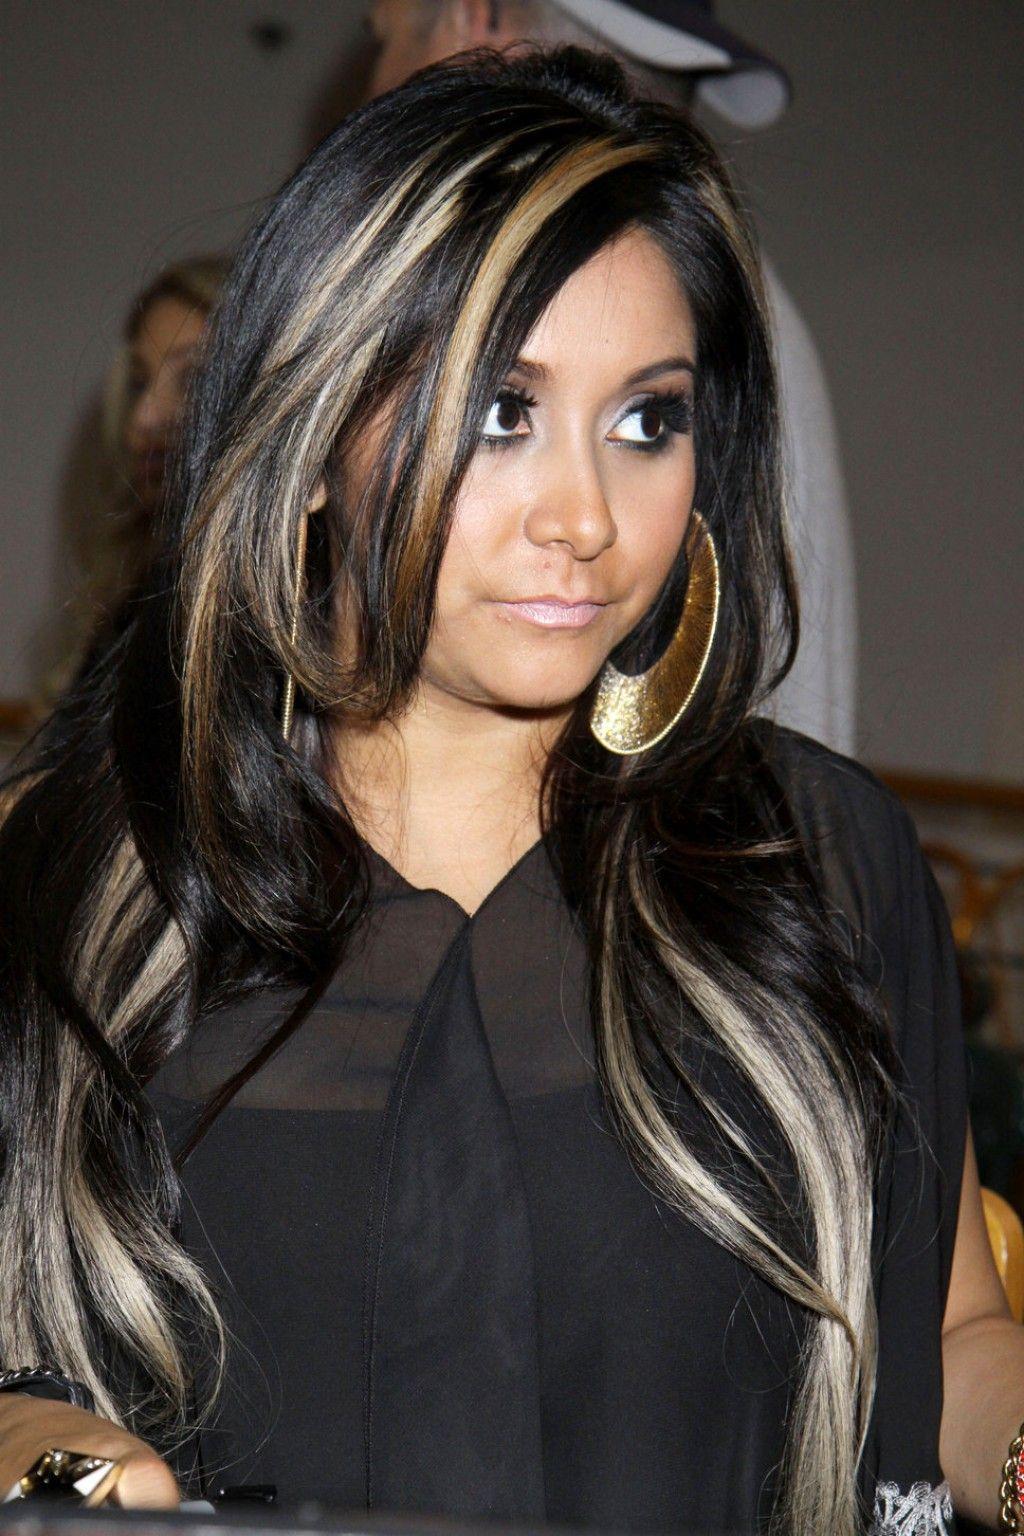 Black Hair With Blonde Highlights Snooki Hair Black Hair With Blonde Highlights Hair Highlights